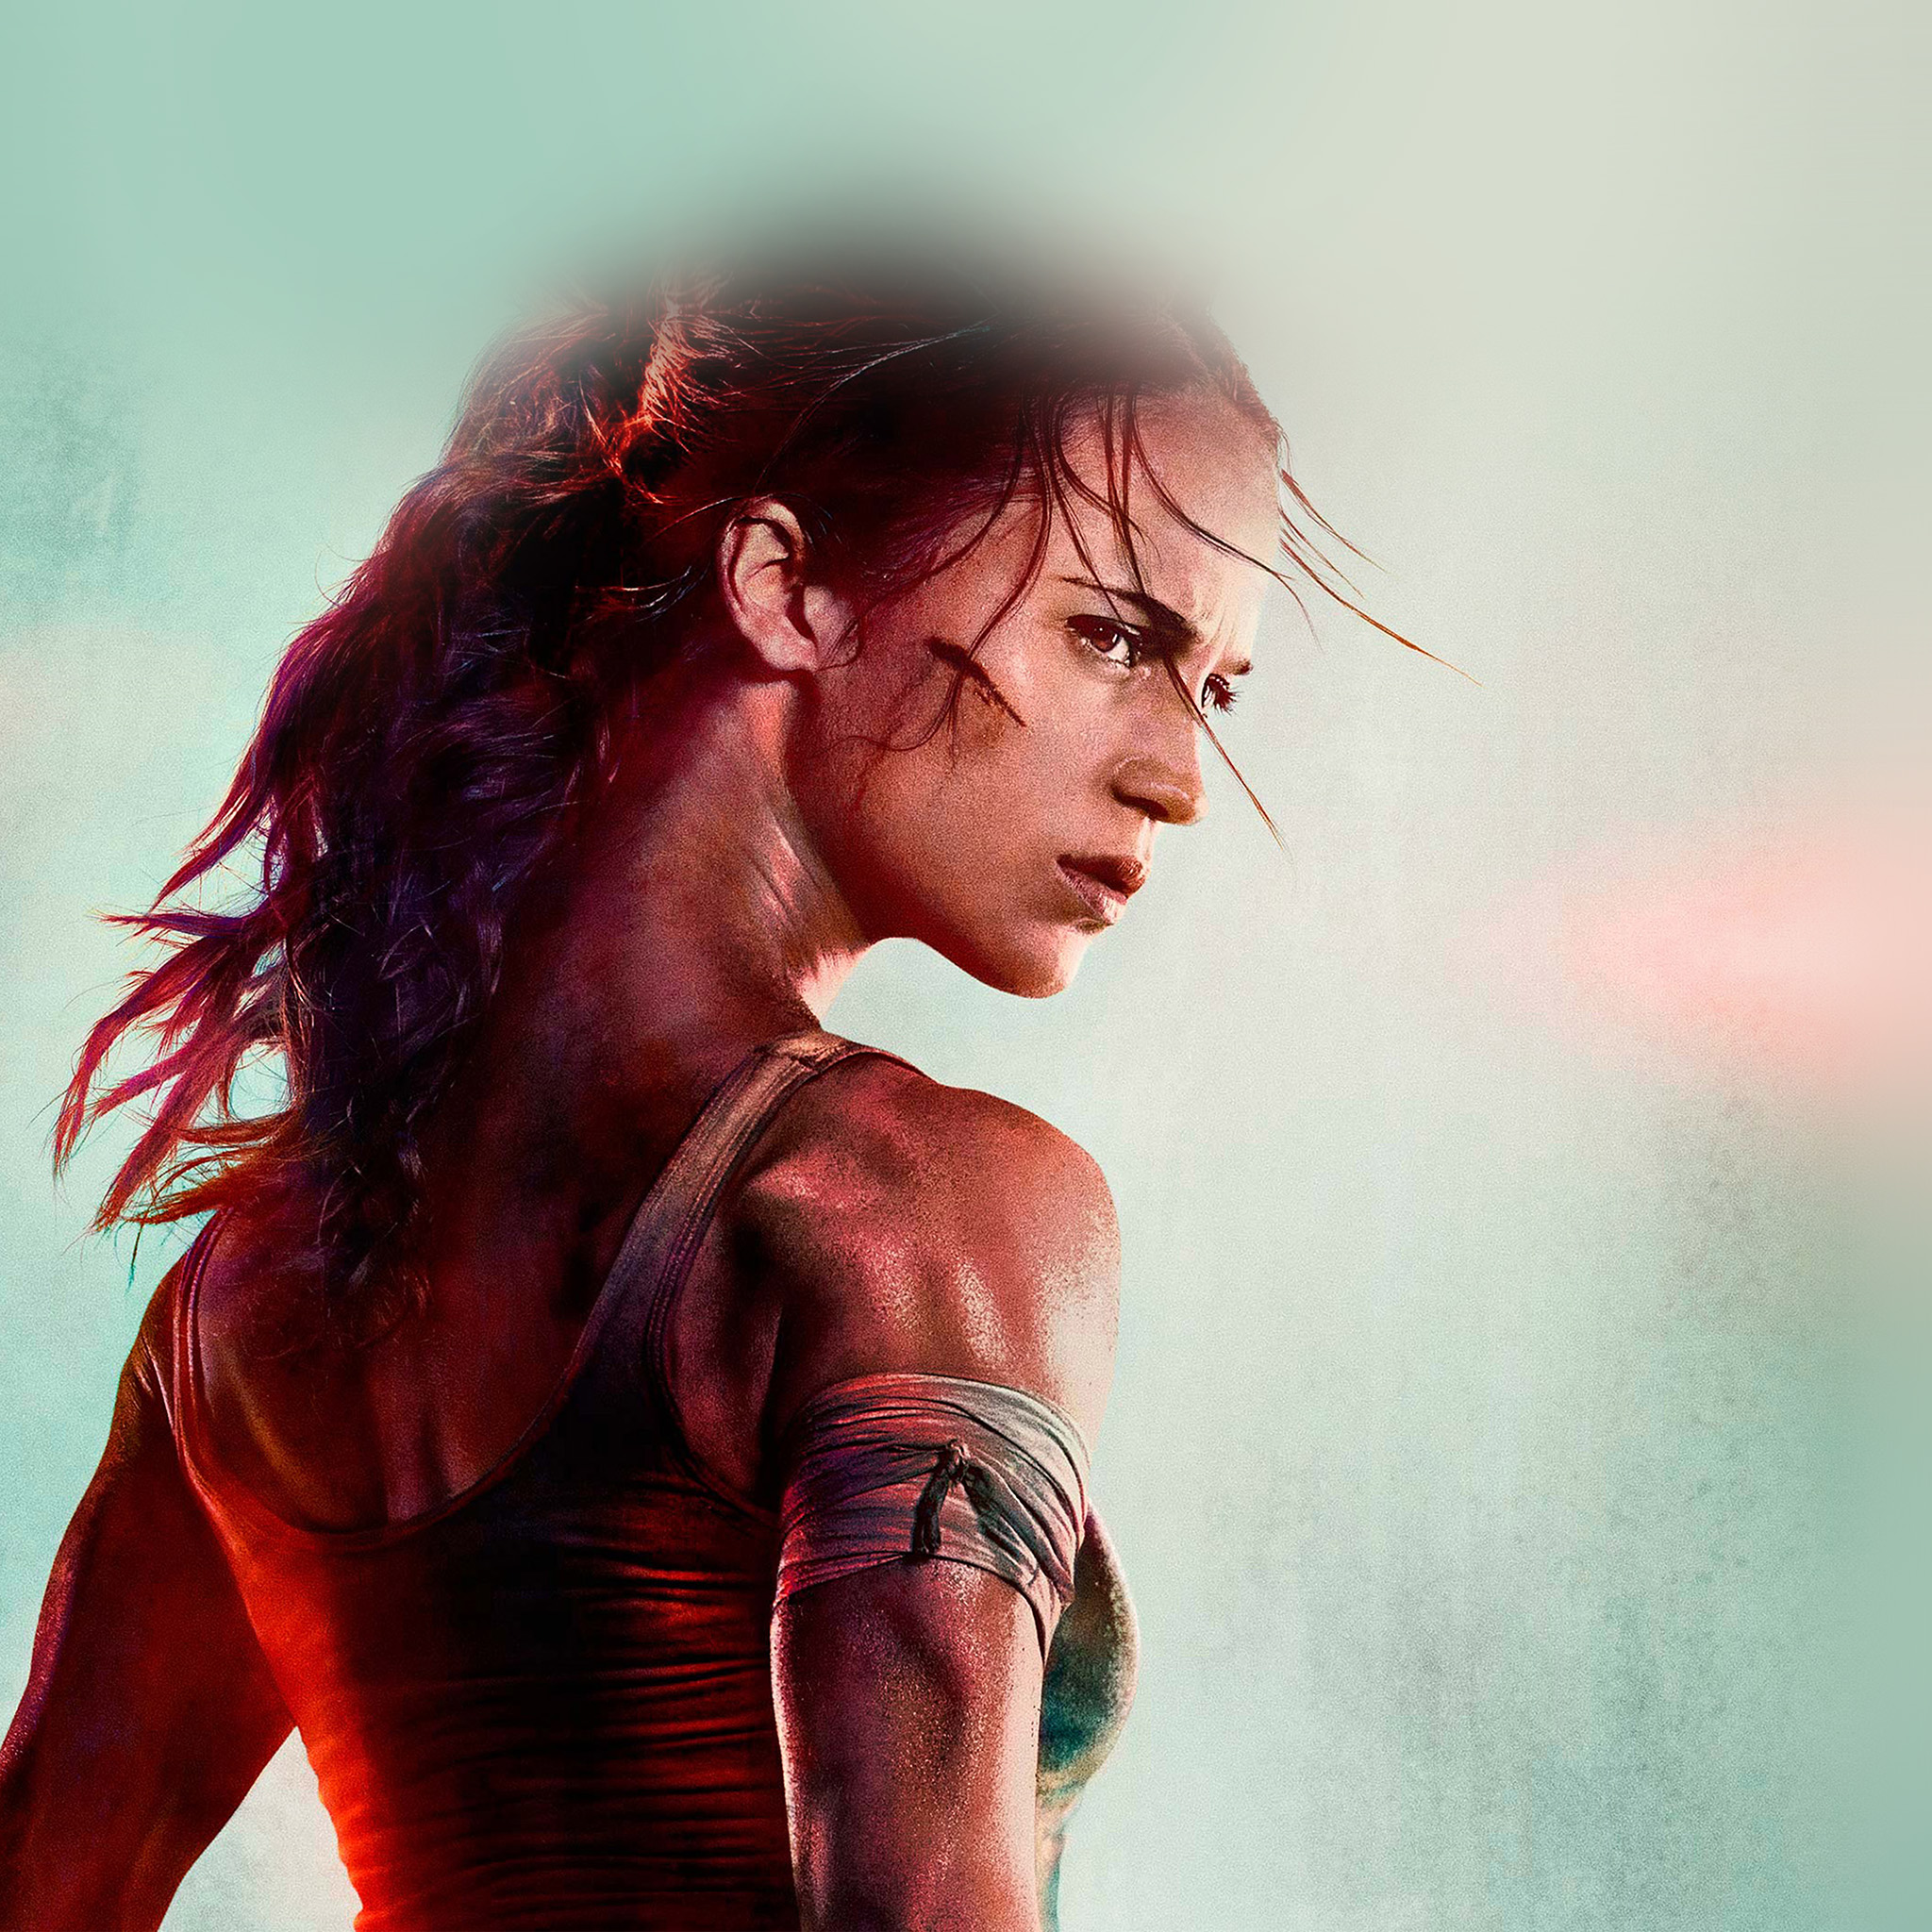 Tomb Raider Iphone Wallpaper: Be46-lara-croft-tomb-raider-film-art-illustration-wallpaper